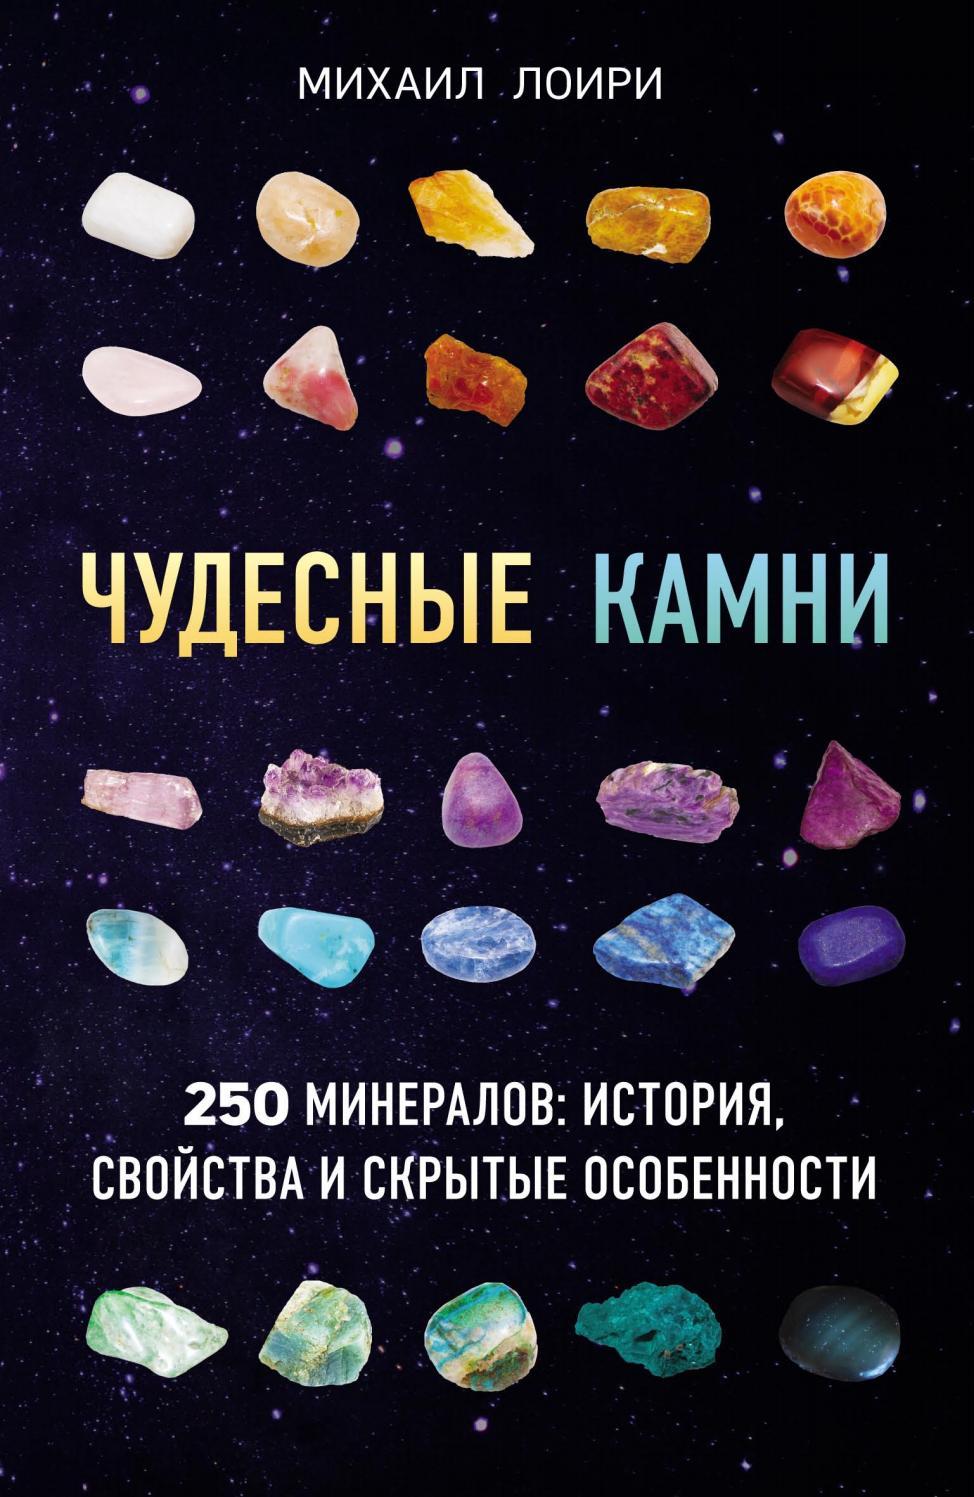 Опал: разновидности и цвета, магические свойства камня